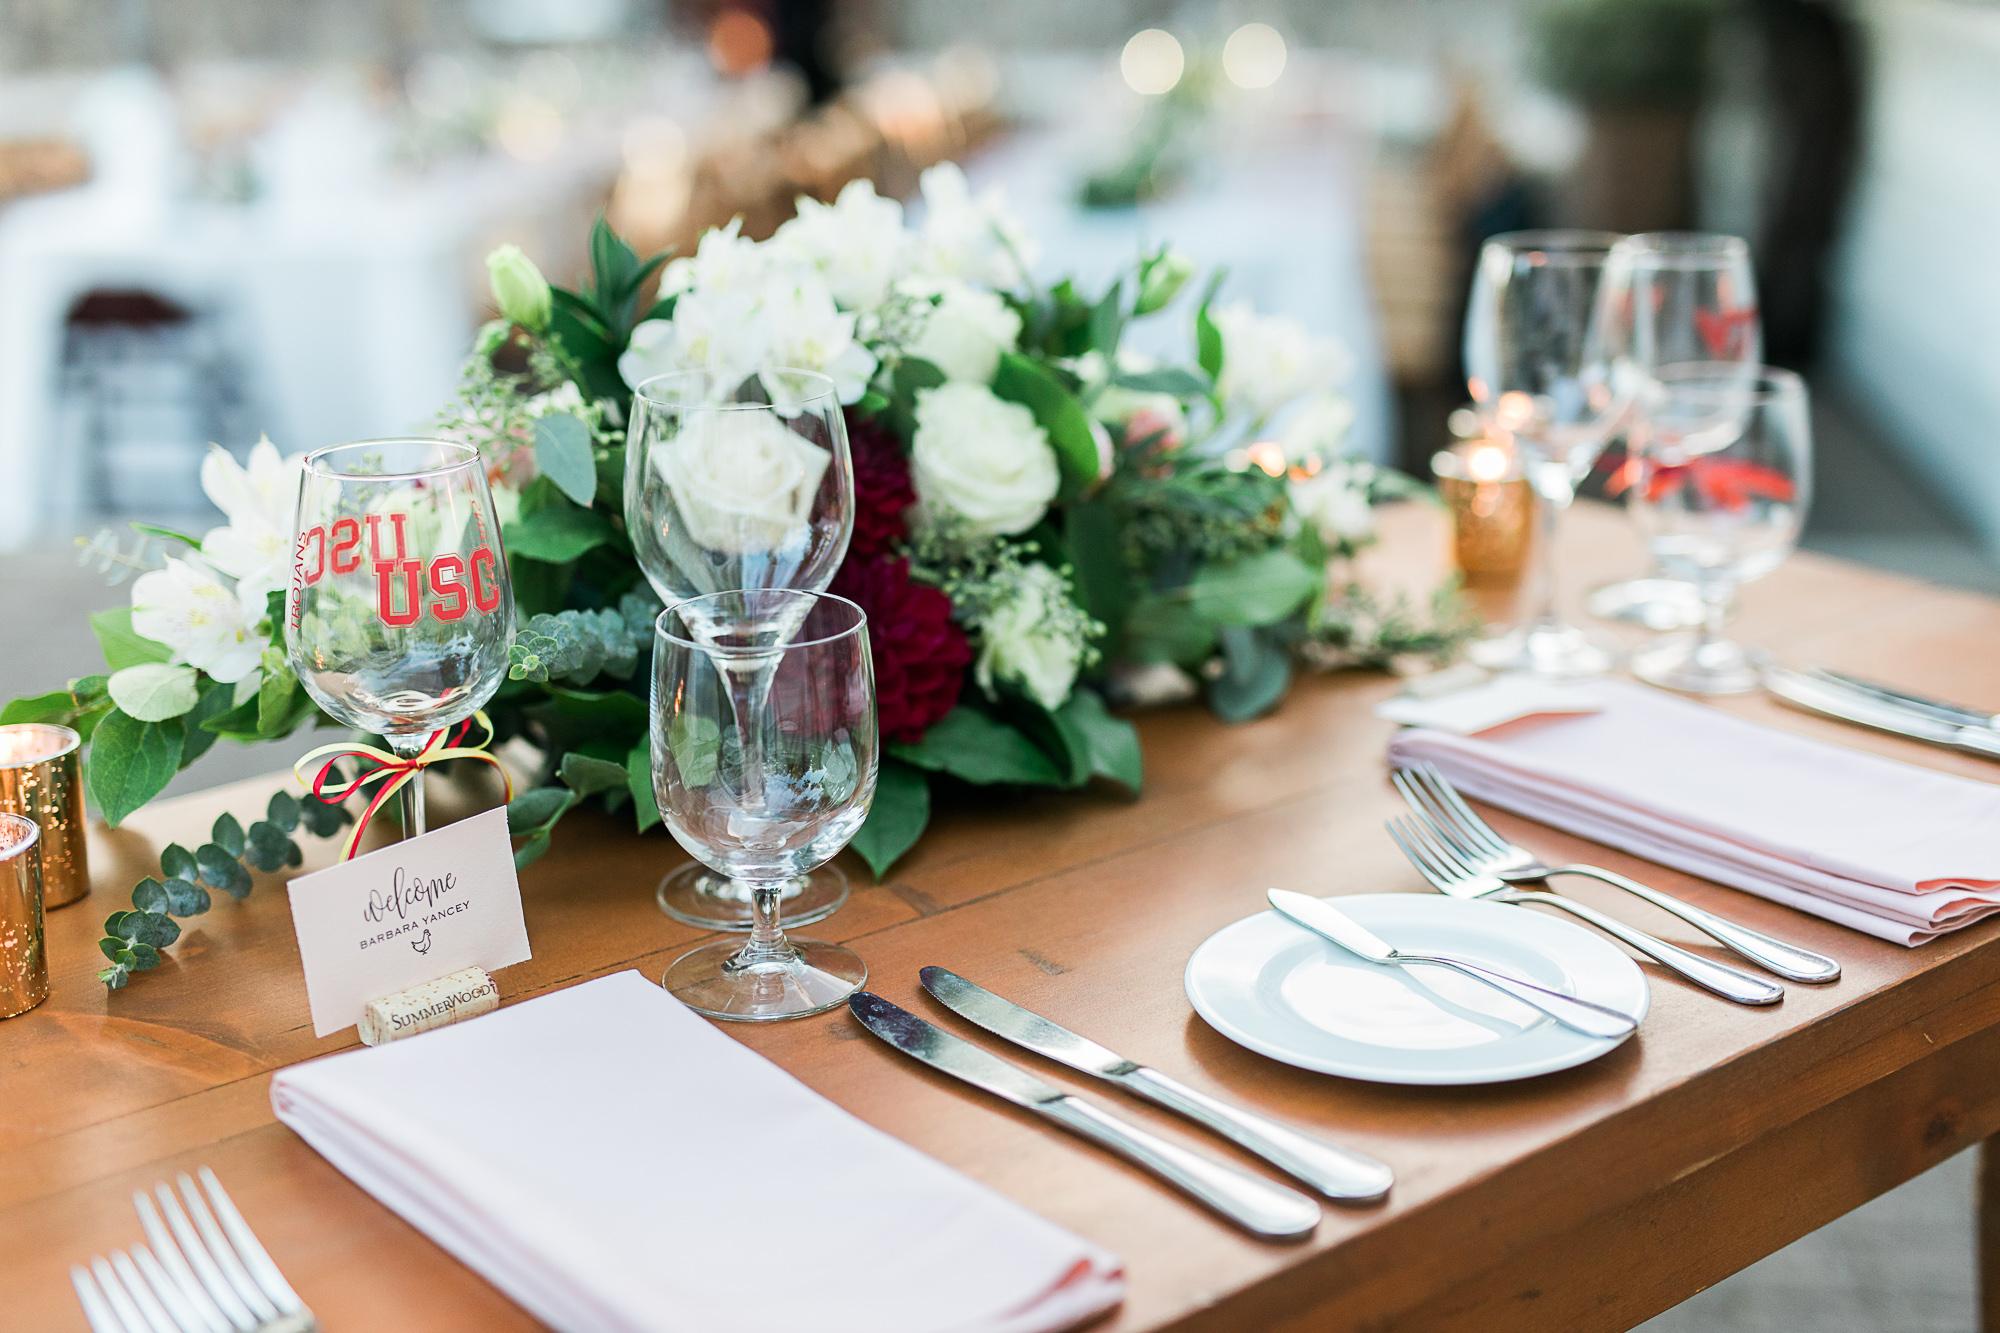 Generals Daughter Wedding Photos by JBJ Pictures - Ramekins Wedding Venue Photographer in Sonoma, Napa (37).jpg